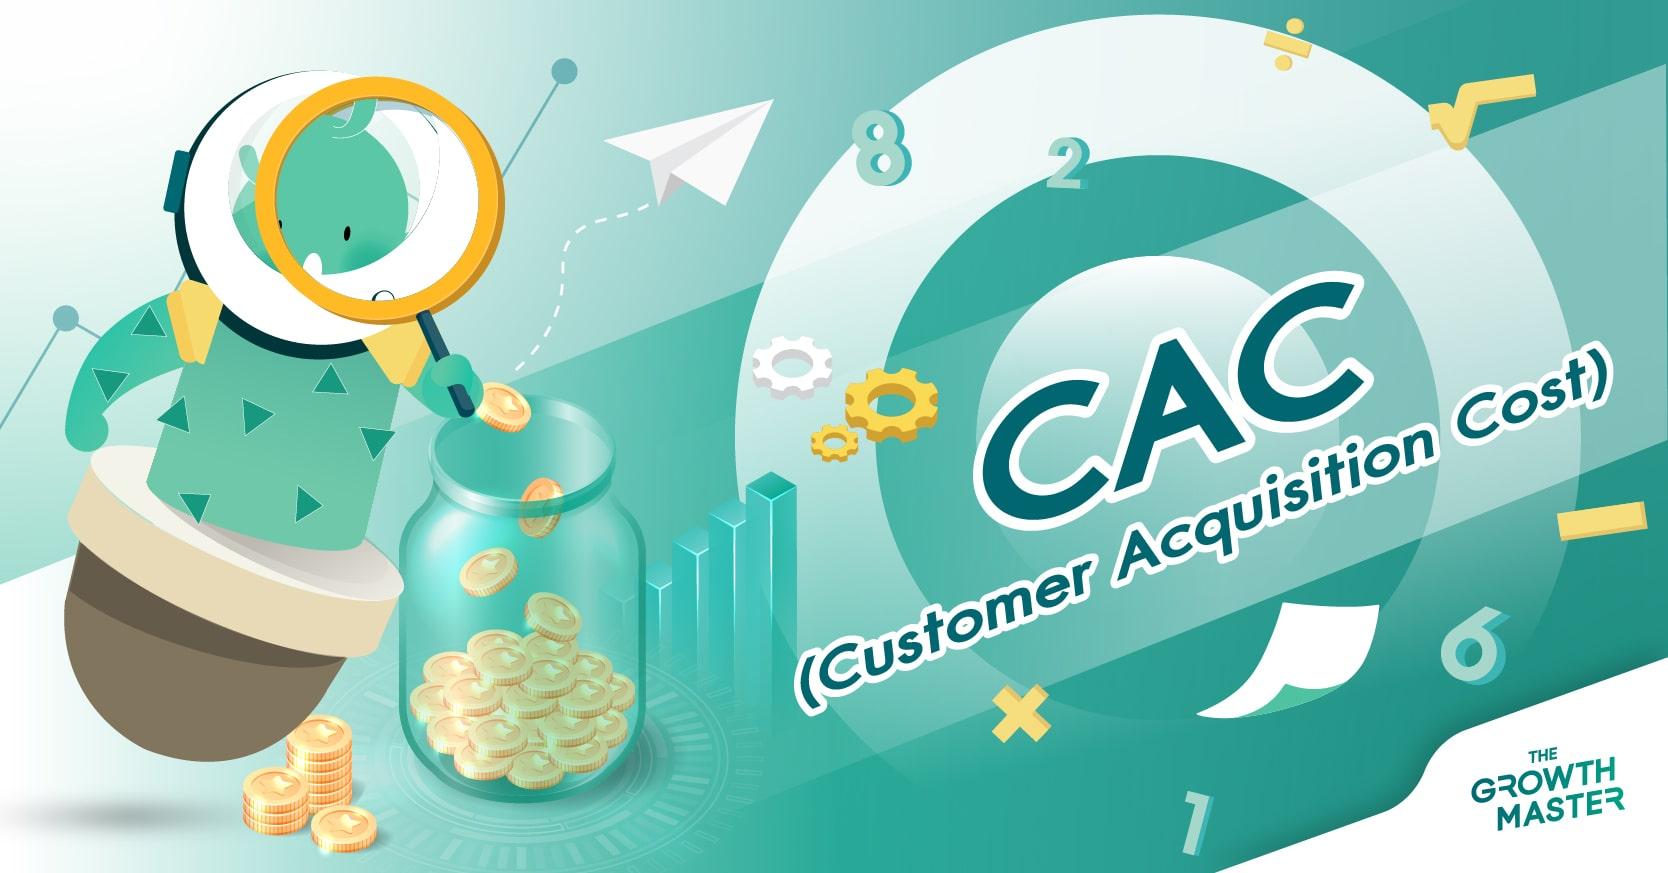 Customer Acquisition Cost 102: แท้จริงแล้ว CAC คำนวณอย่างไรกันแน่?